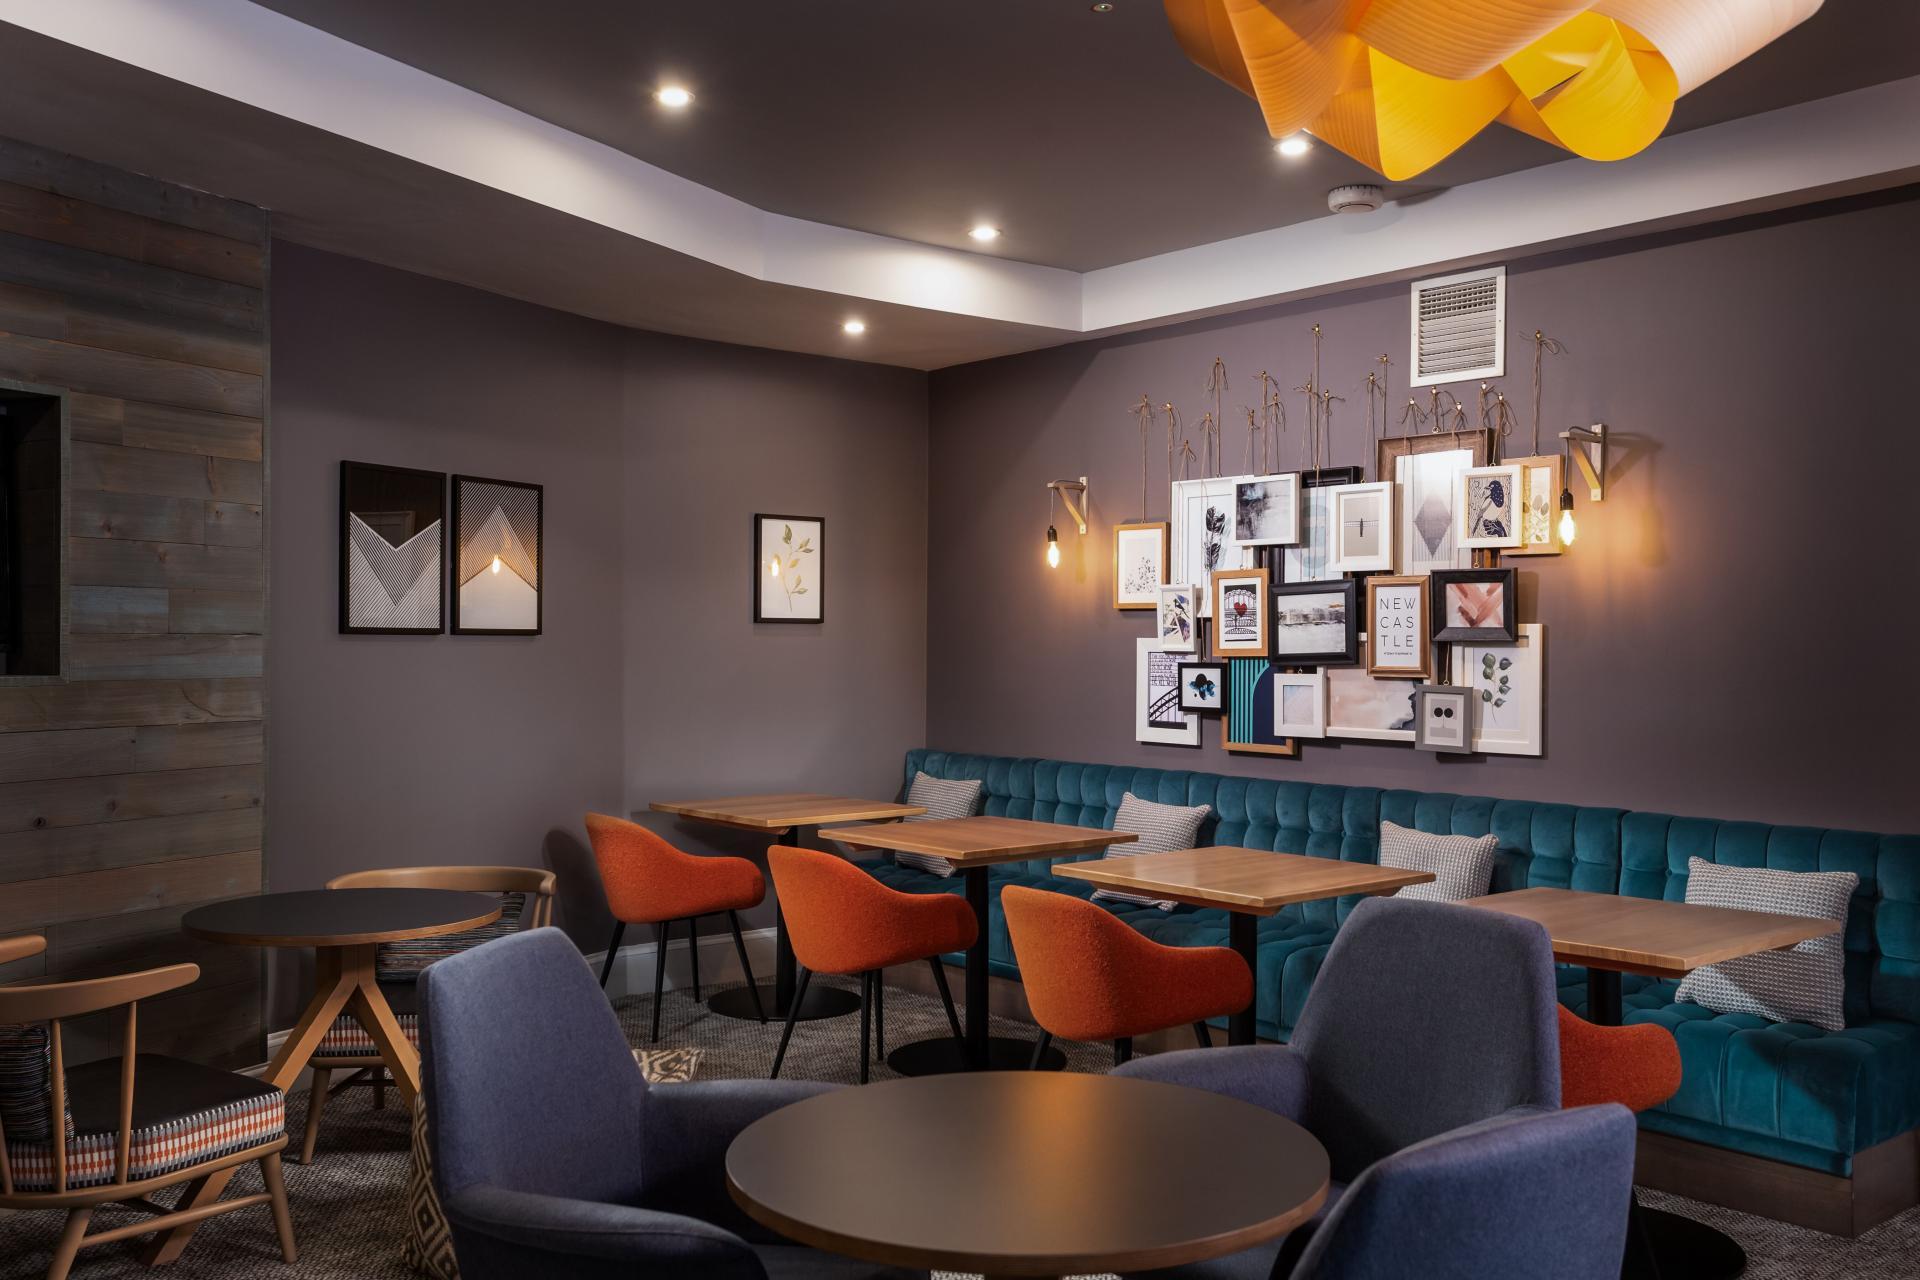 Lounge Area at Newcastle Staybridge Suites Newcastle - Citybase Apartments